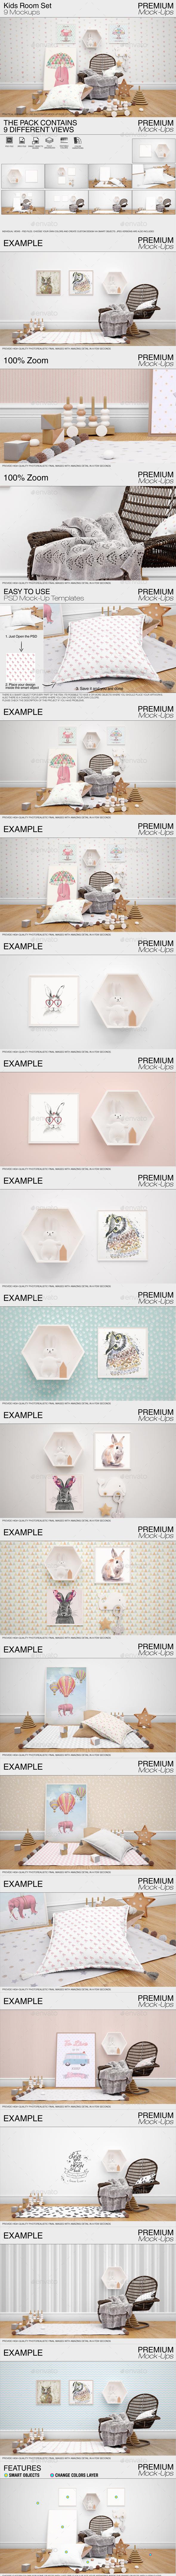 Kids Room Mockup Pack - Print Product Mock-Ups